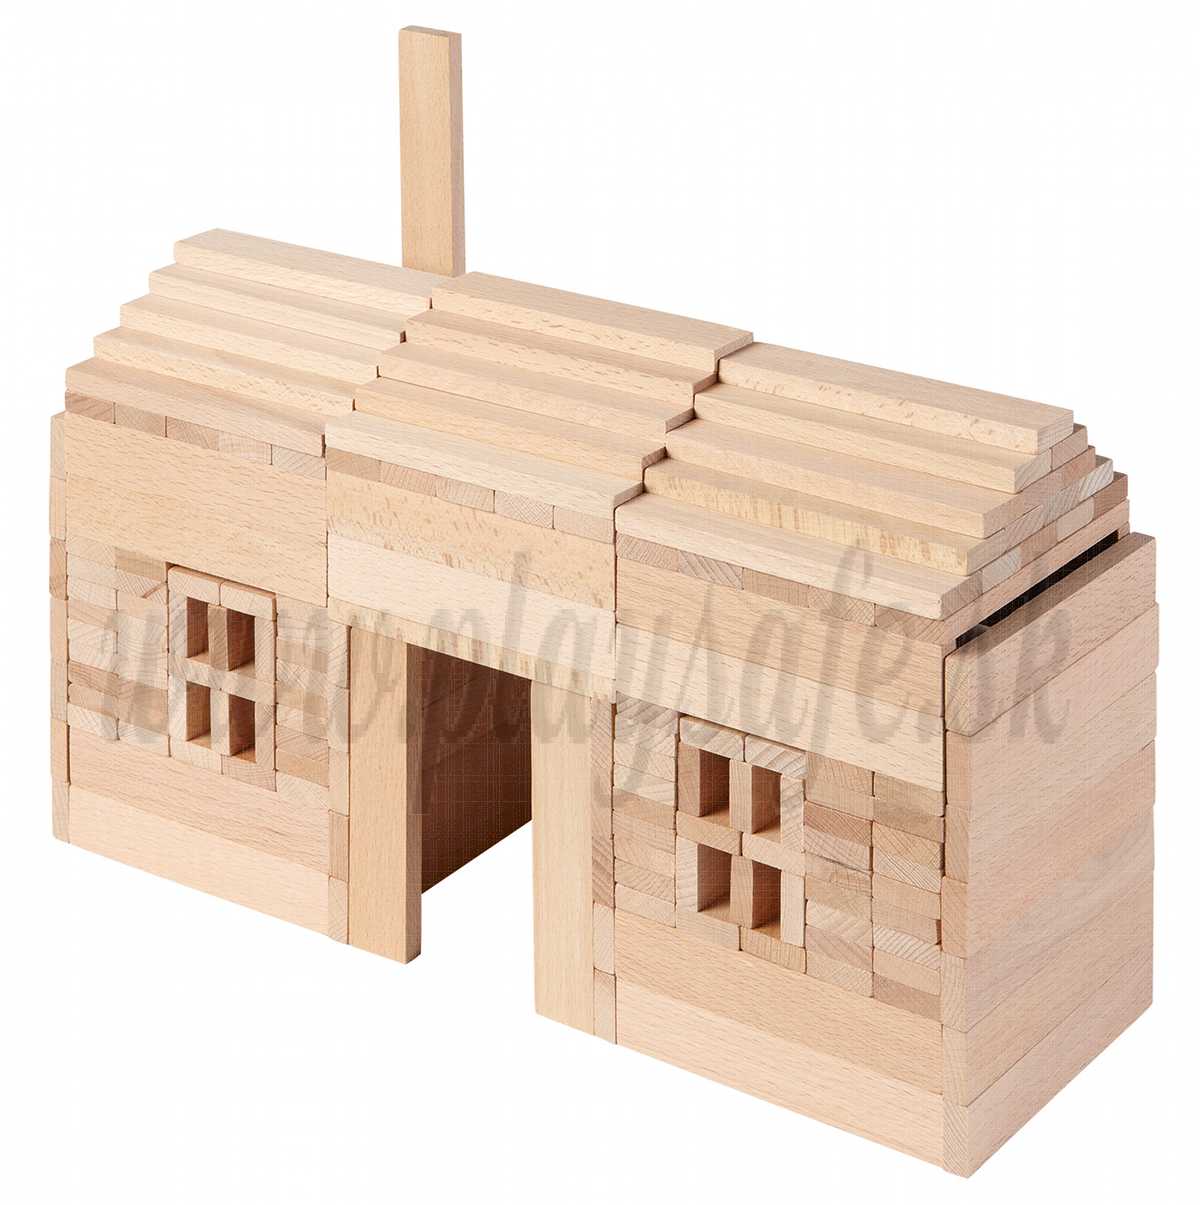 Goki Wooden Building Bricks Nature, 200 pieces